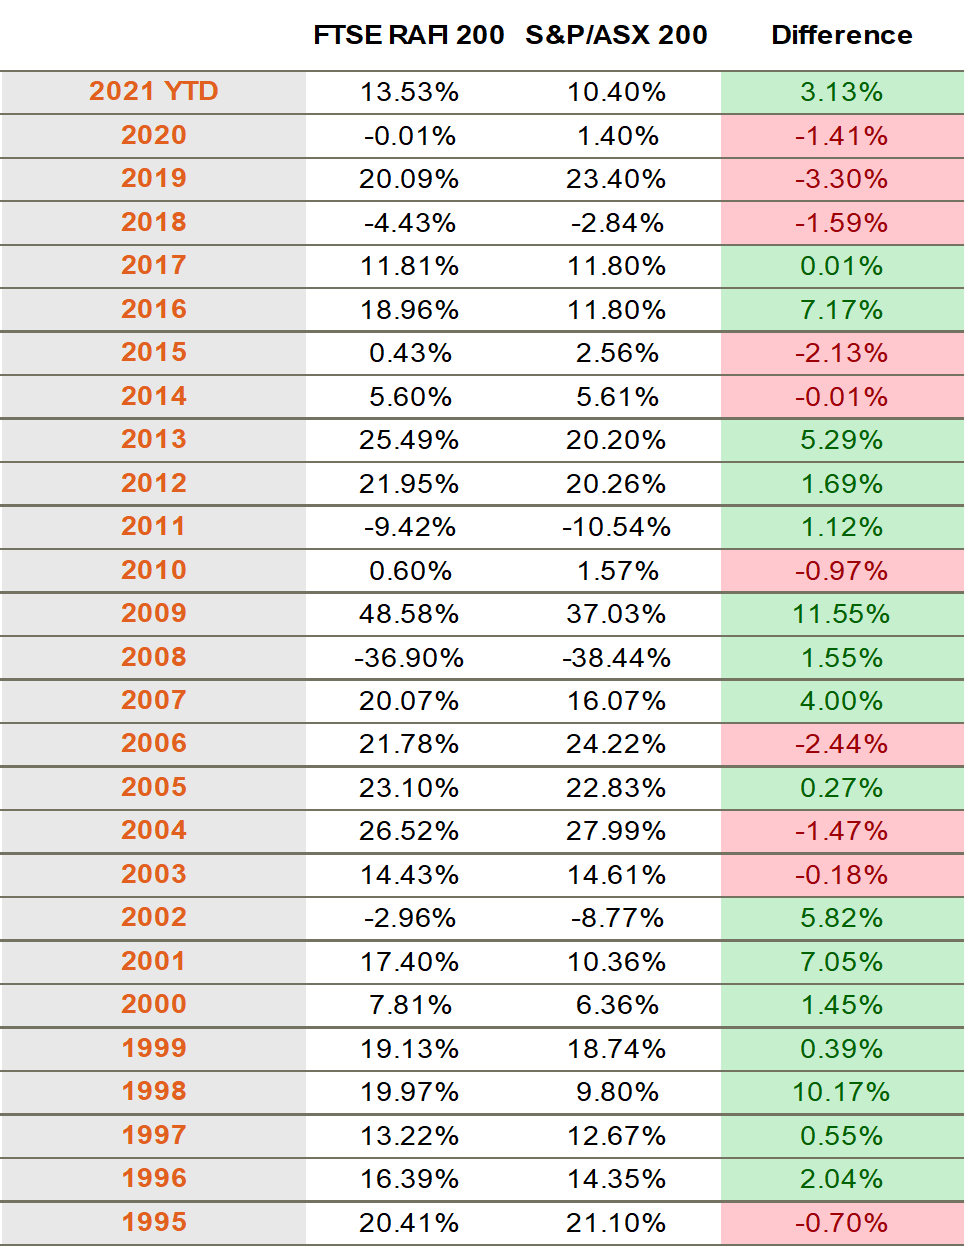 FTSE RAFI Australia 200 Index v S&P ASX 200 Index Total Returns by Calendar Year 2021